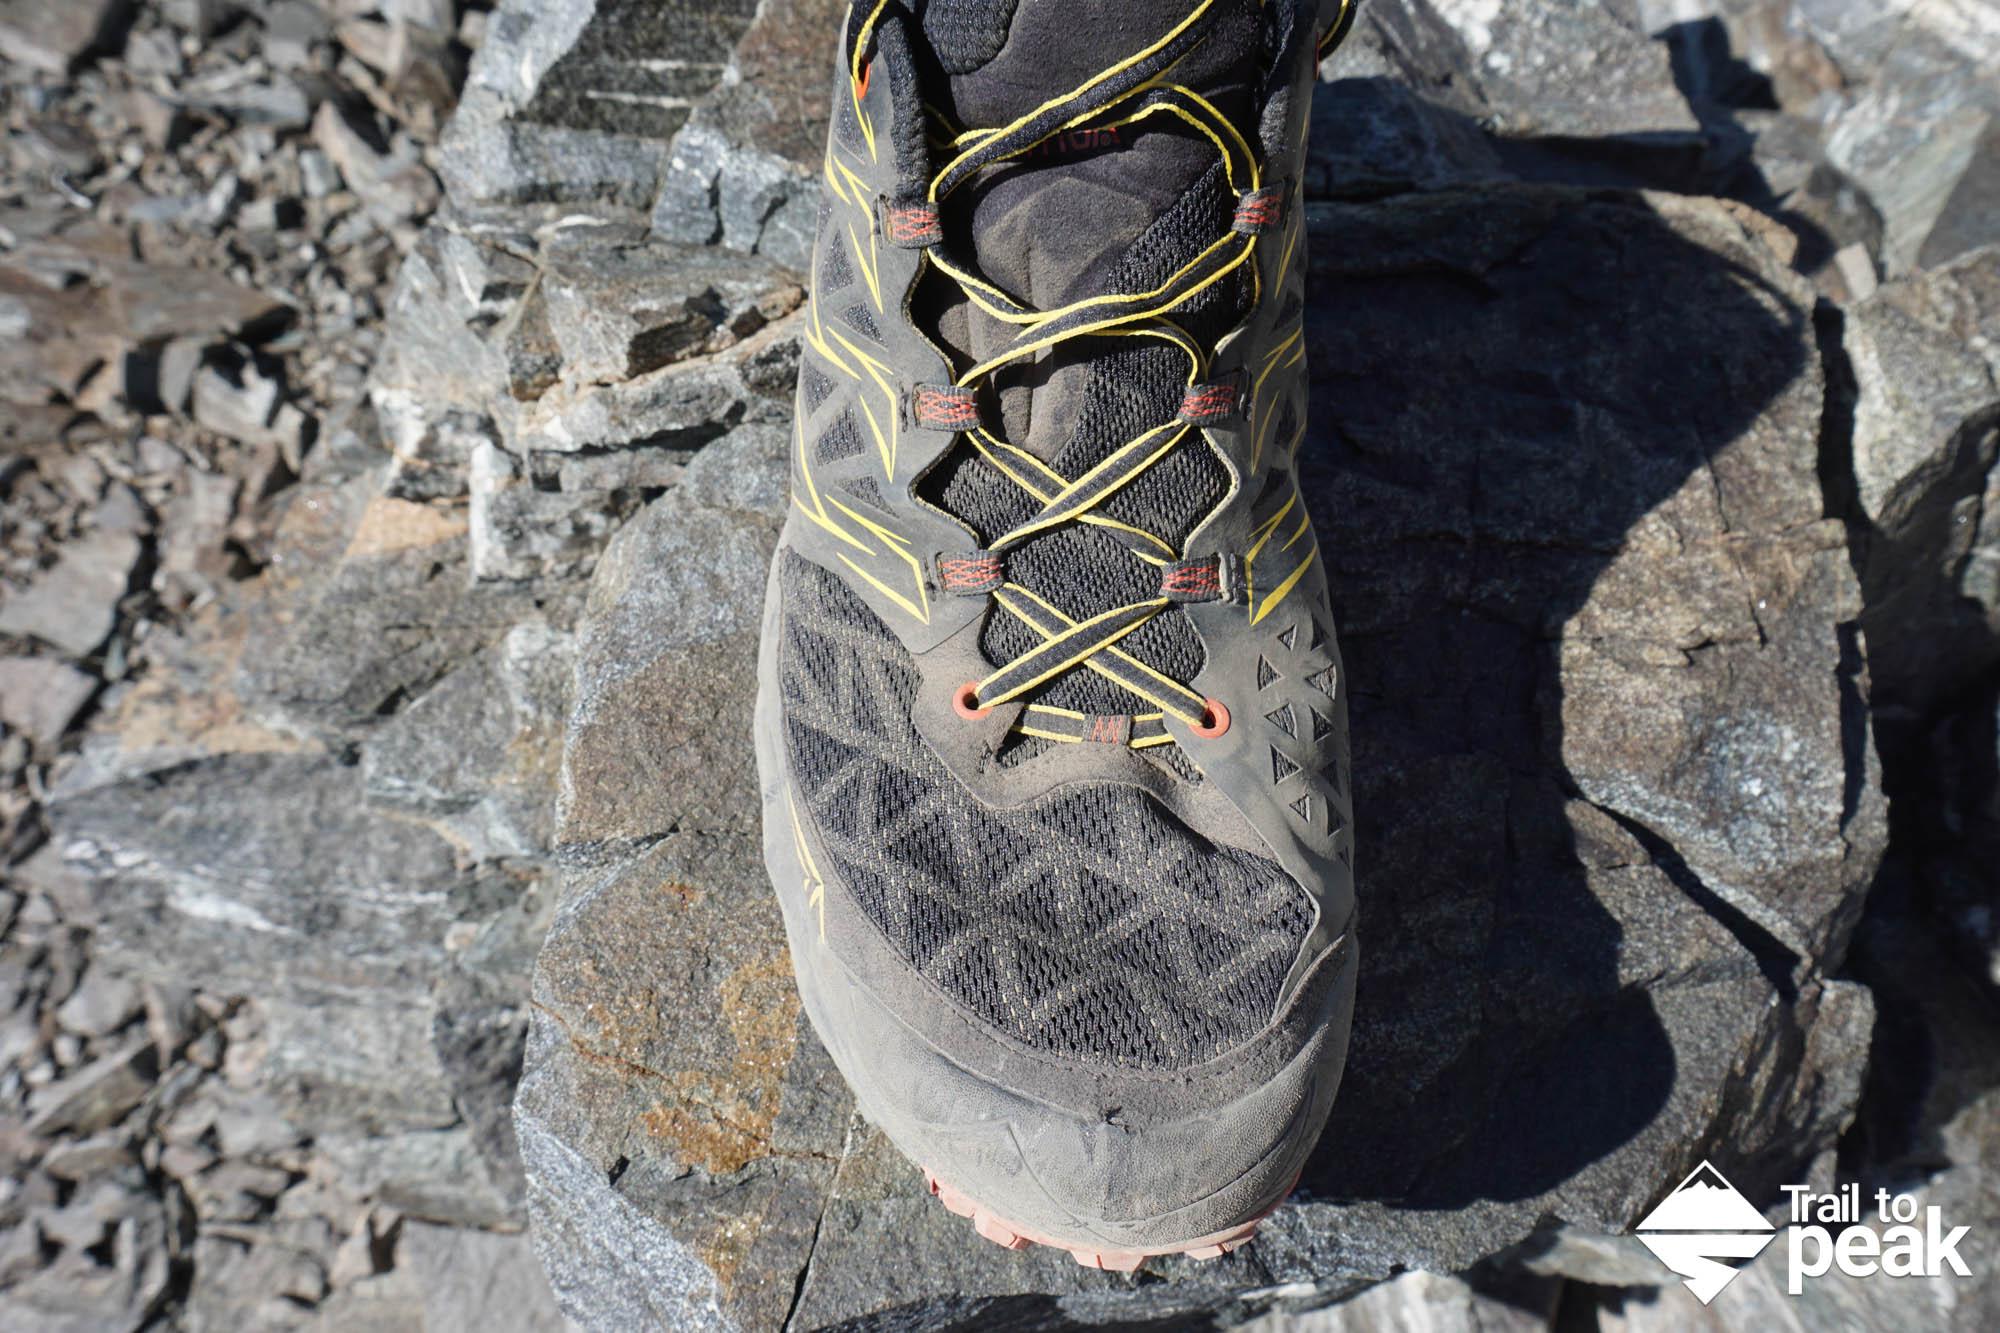 Gear Review: La Sportiva Akyra - Trail